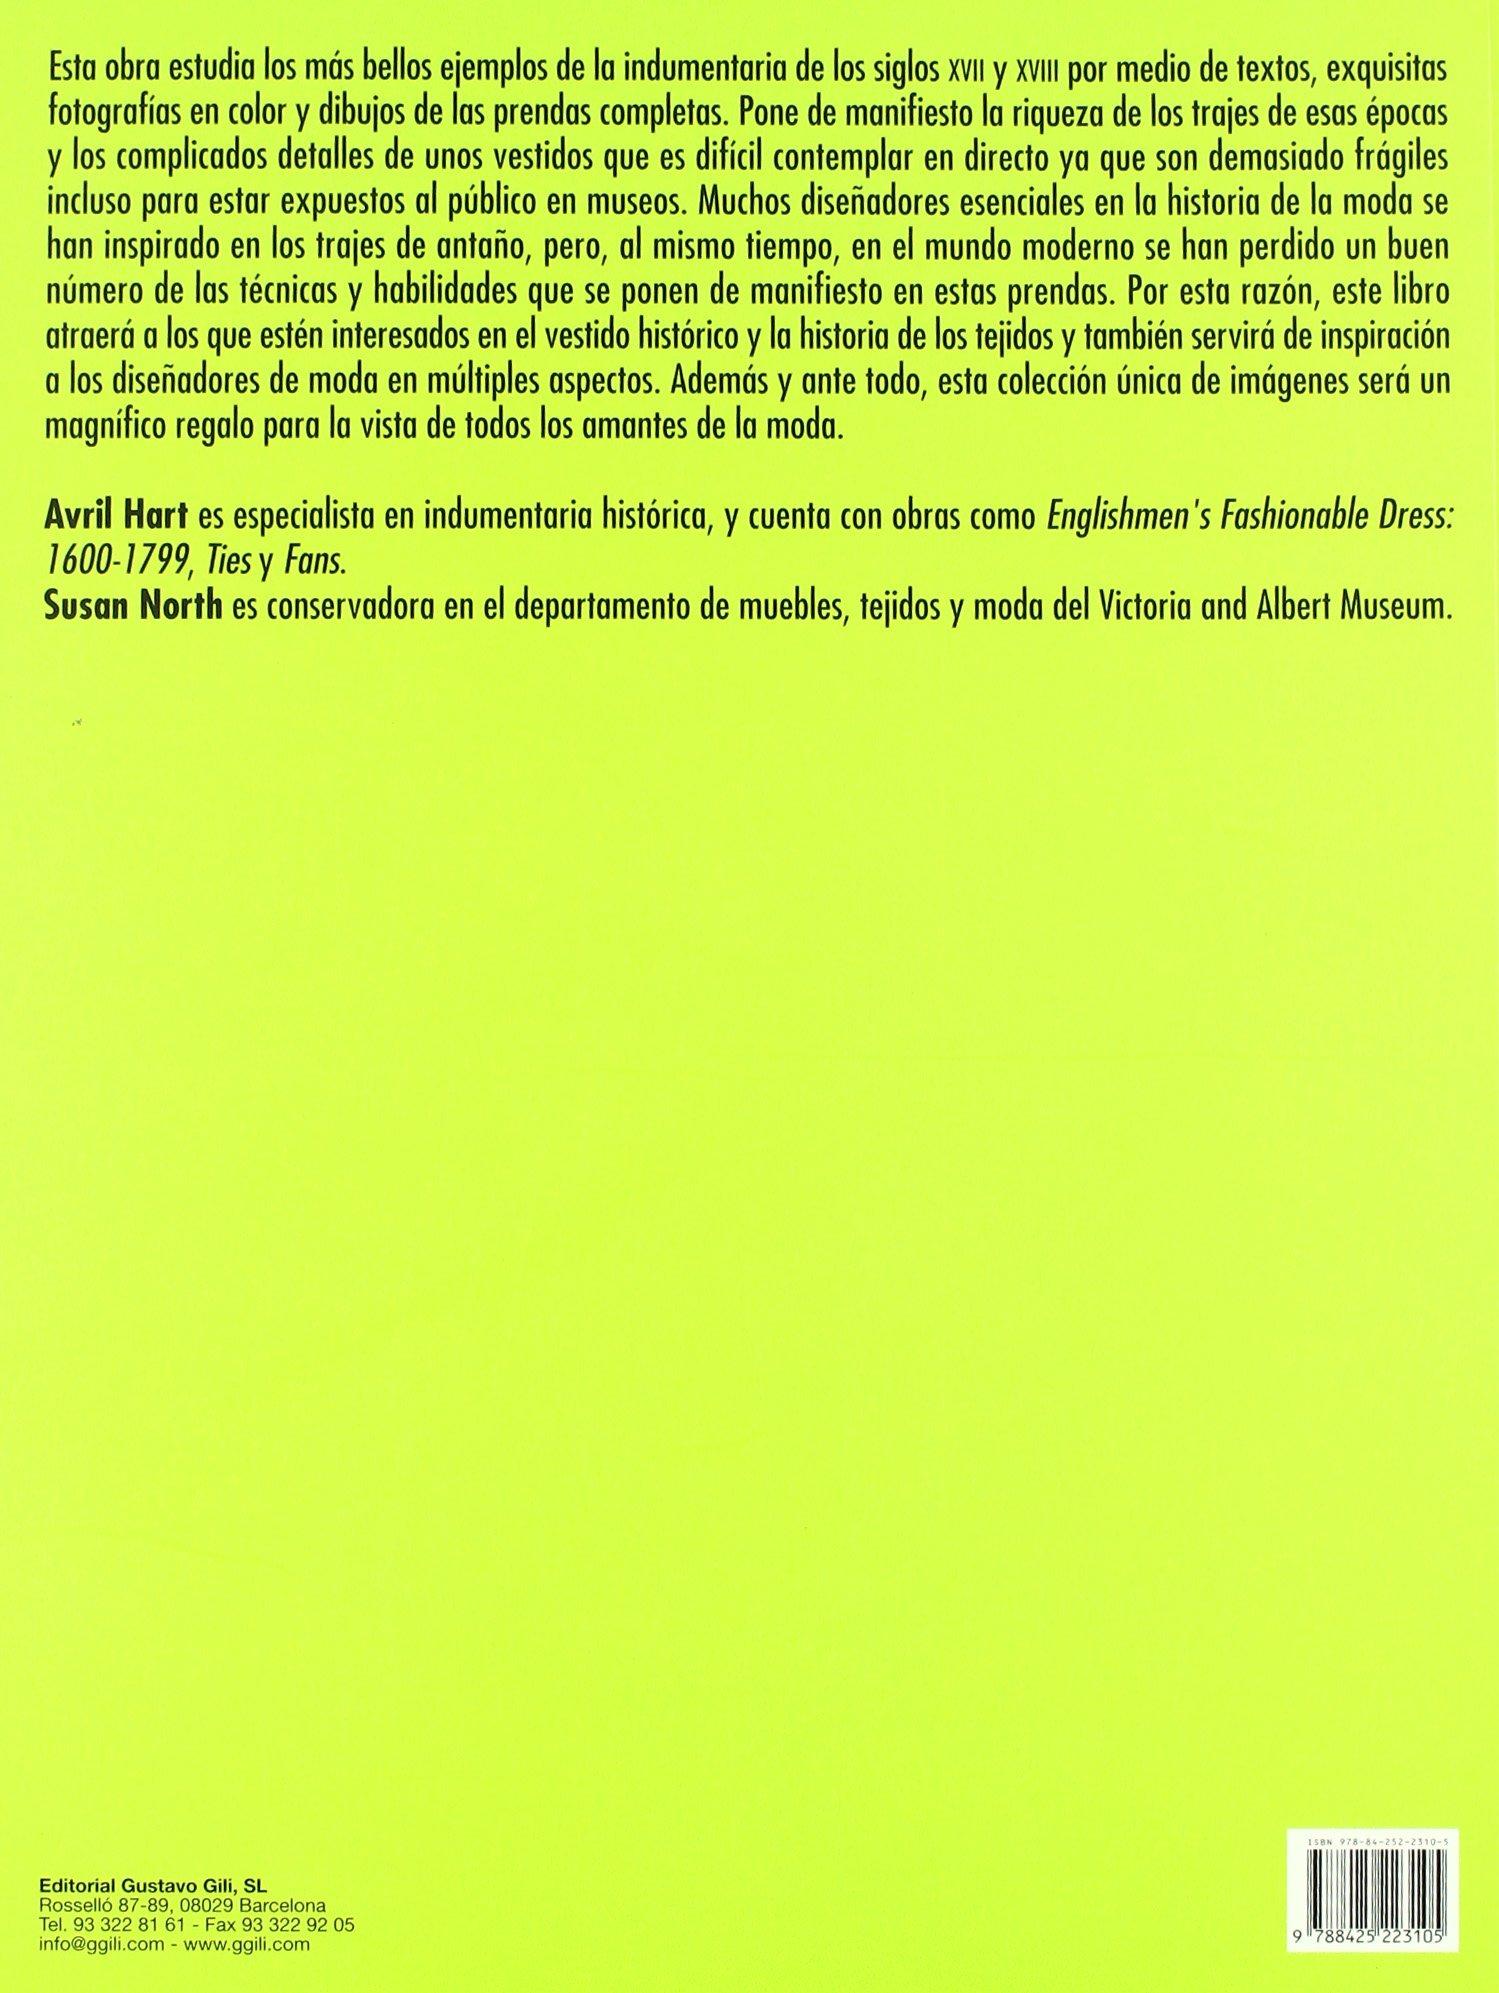 La Moda De Los Siglos Xvii Xviii En Detalle Avril Hart  # Muebles Gustavo